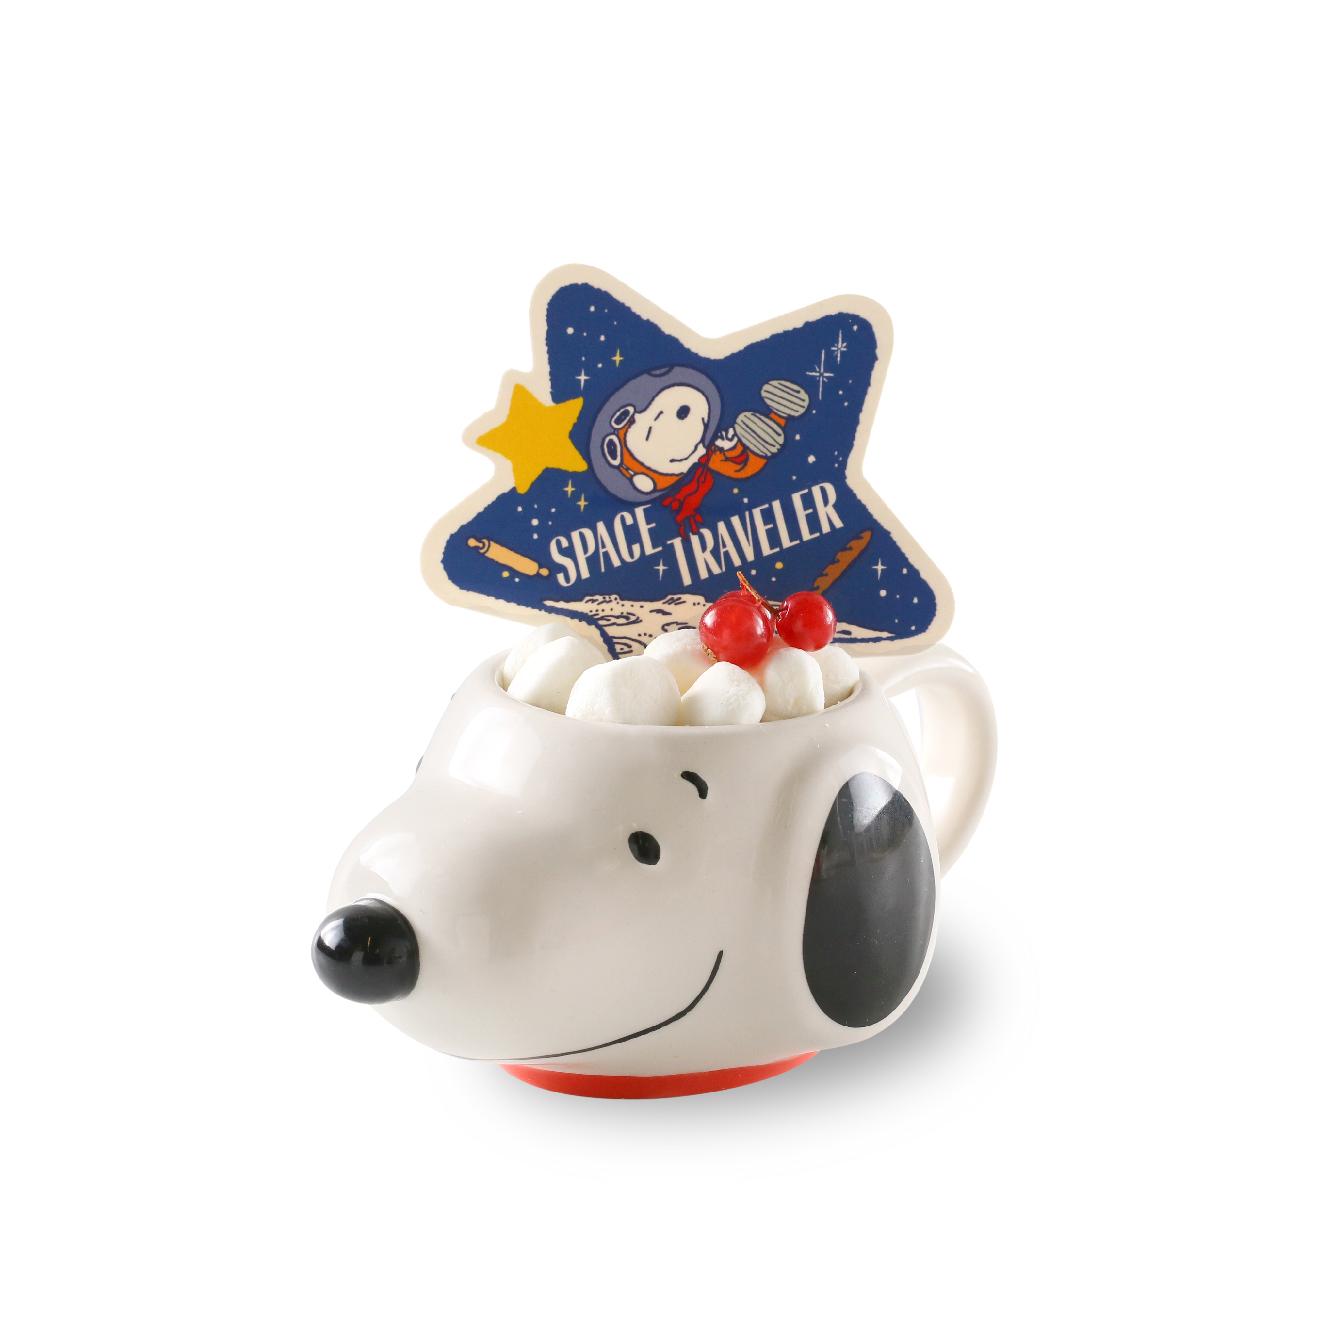 Snoopy Space Traveler -Strawberry Jam Cream Cake